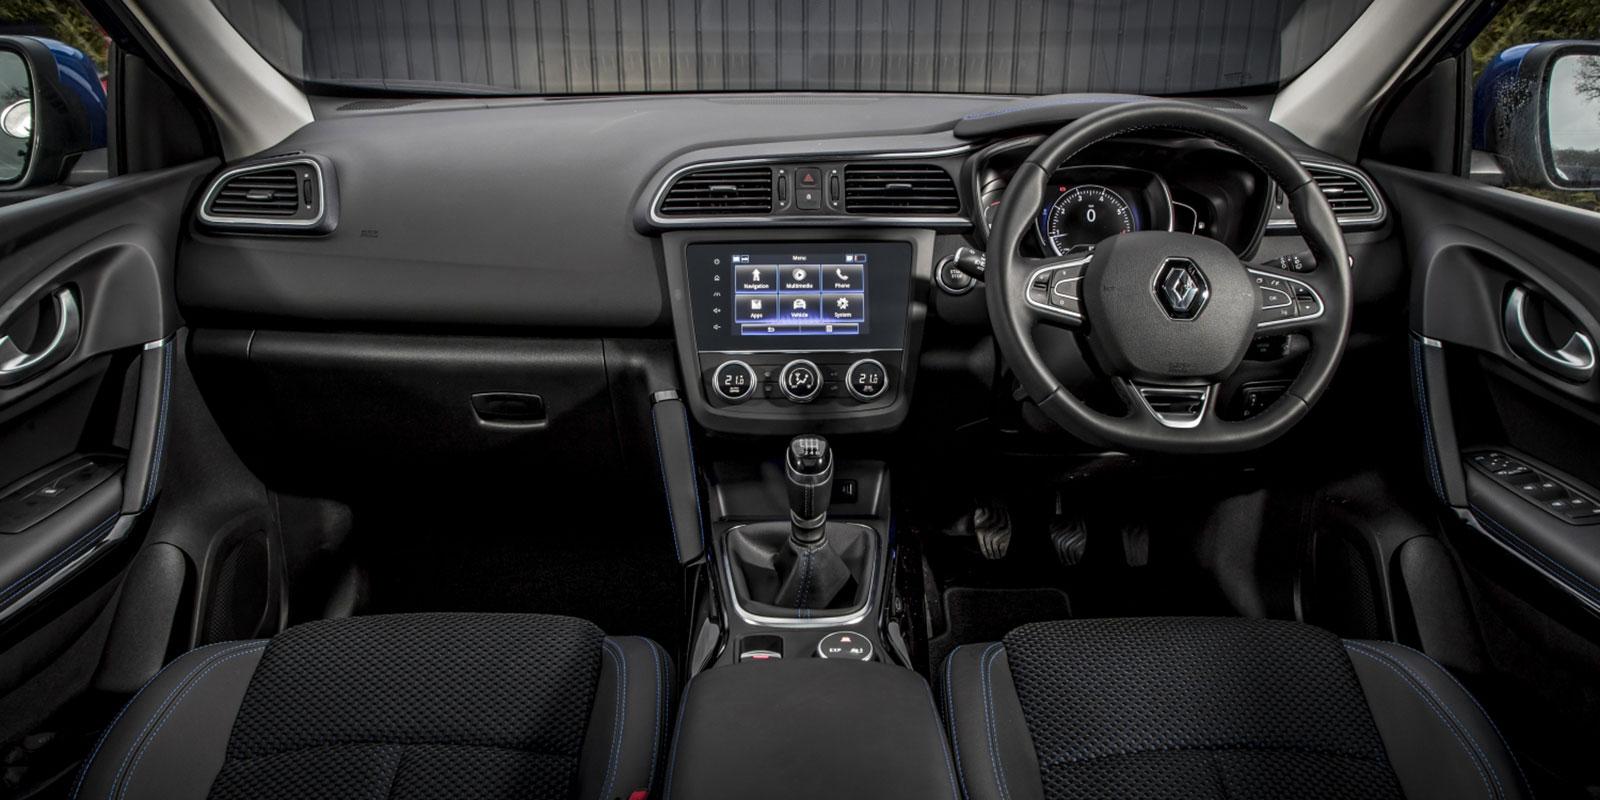 Renault Kadjar Interior Amp Infotainment Carwow